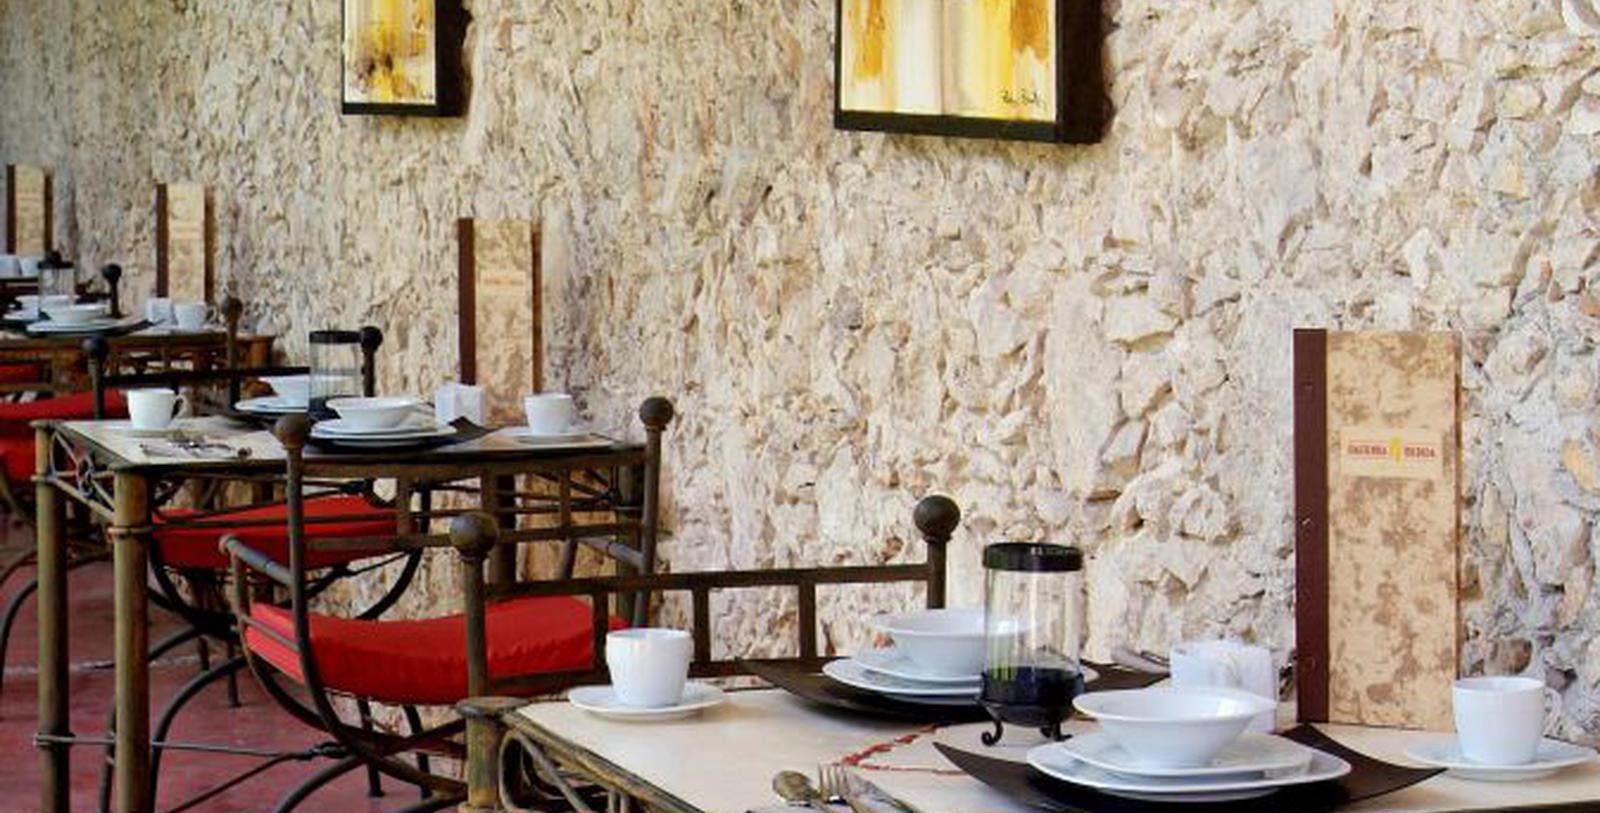 Image of Restaurant, Hotel Hacienda Merida, Mexico, 1700s, Member of Historic Hotels Worldwide, Taste